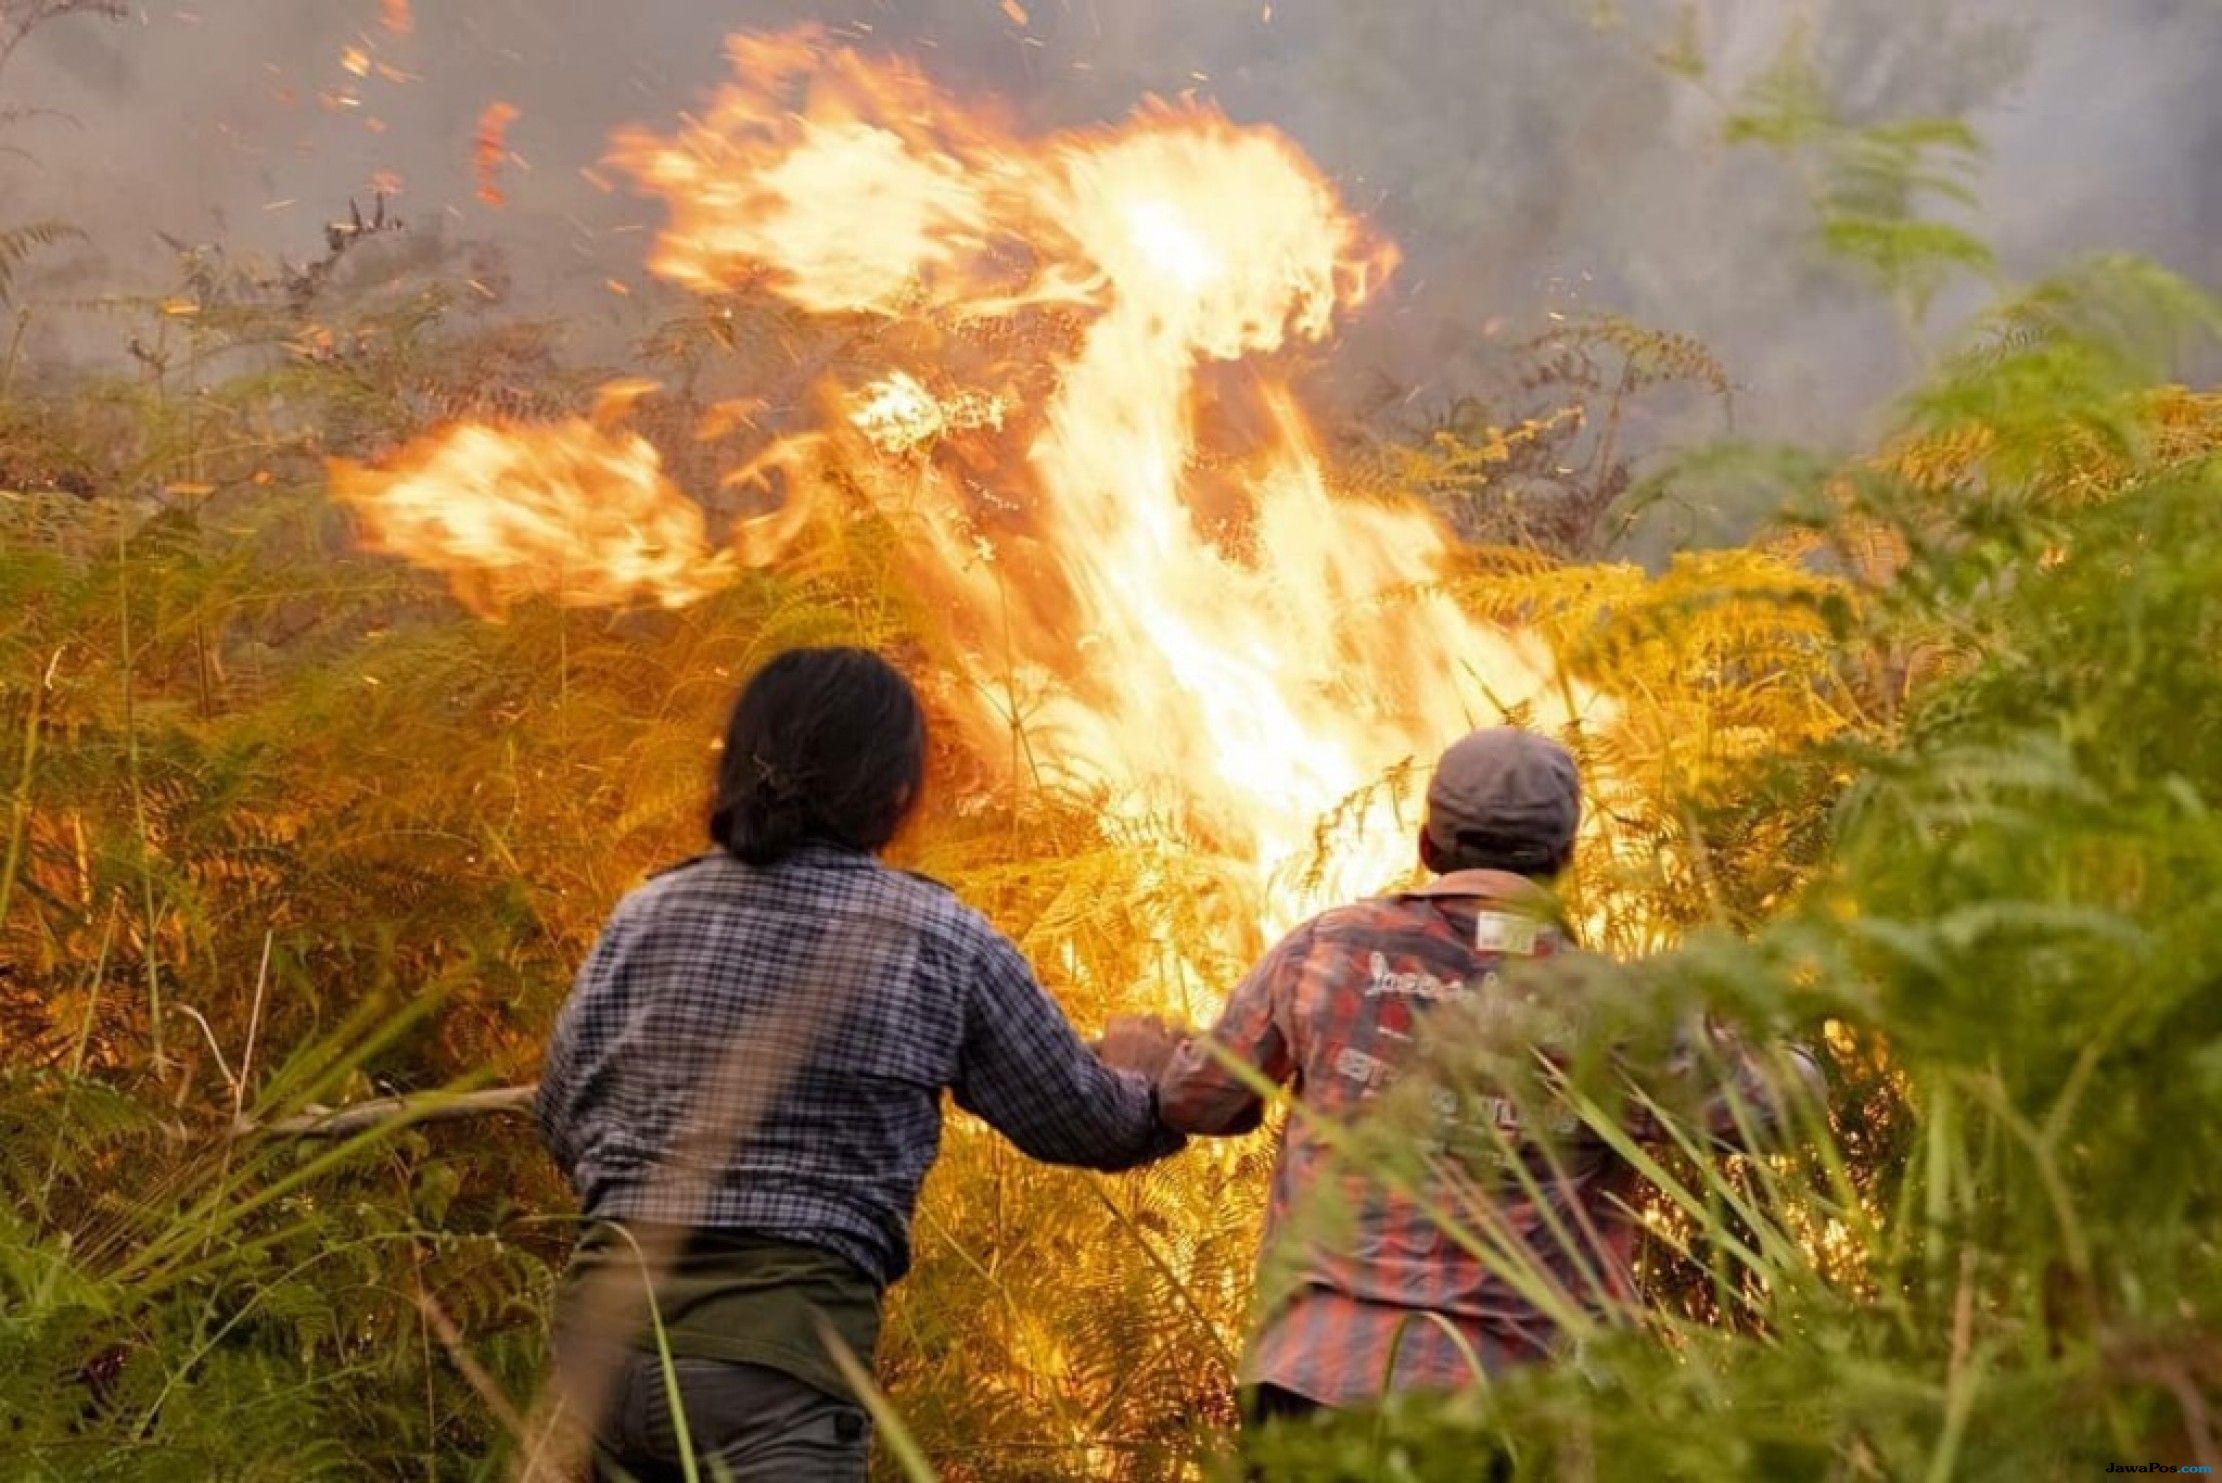 Kebakaran Hutan dan Lahan Nyaris Renggut Nyawa Bayi